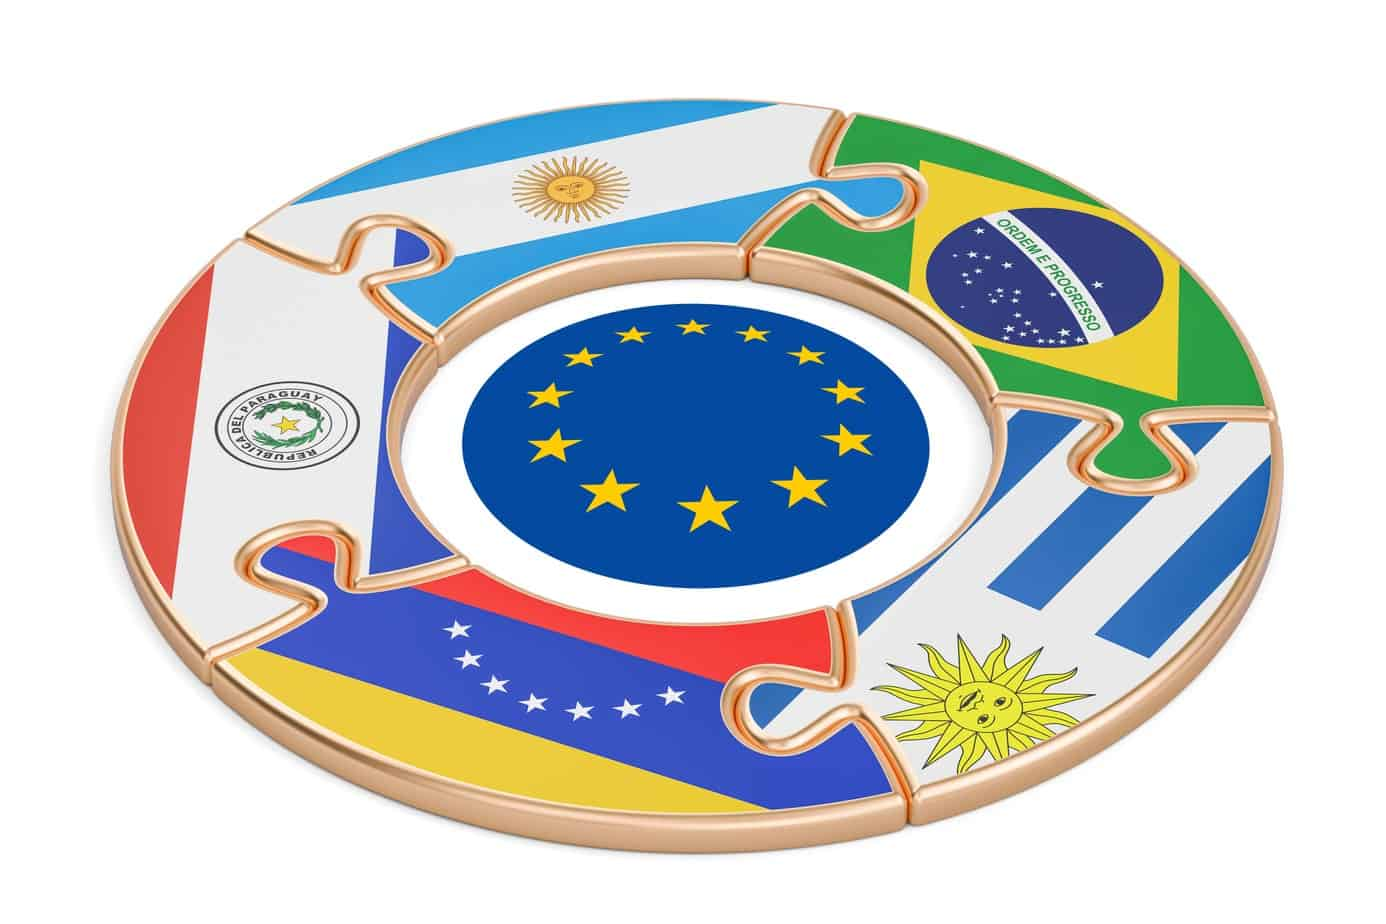 Jair Bolsonaro, a challenge for the European Union